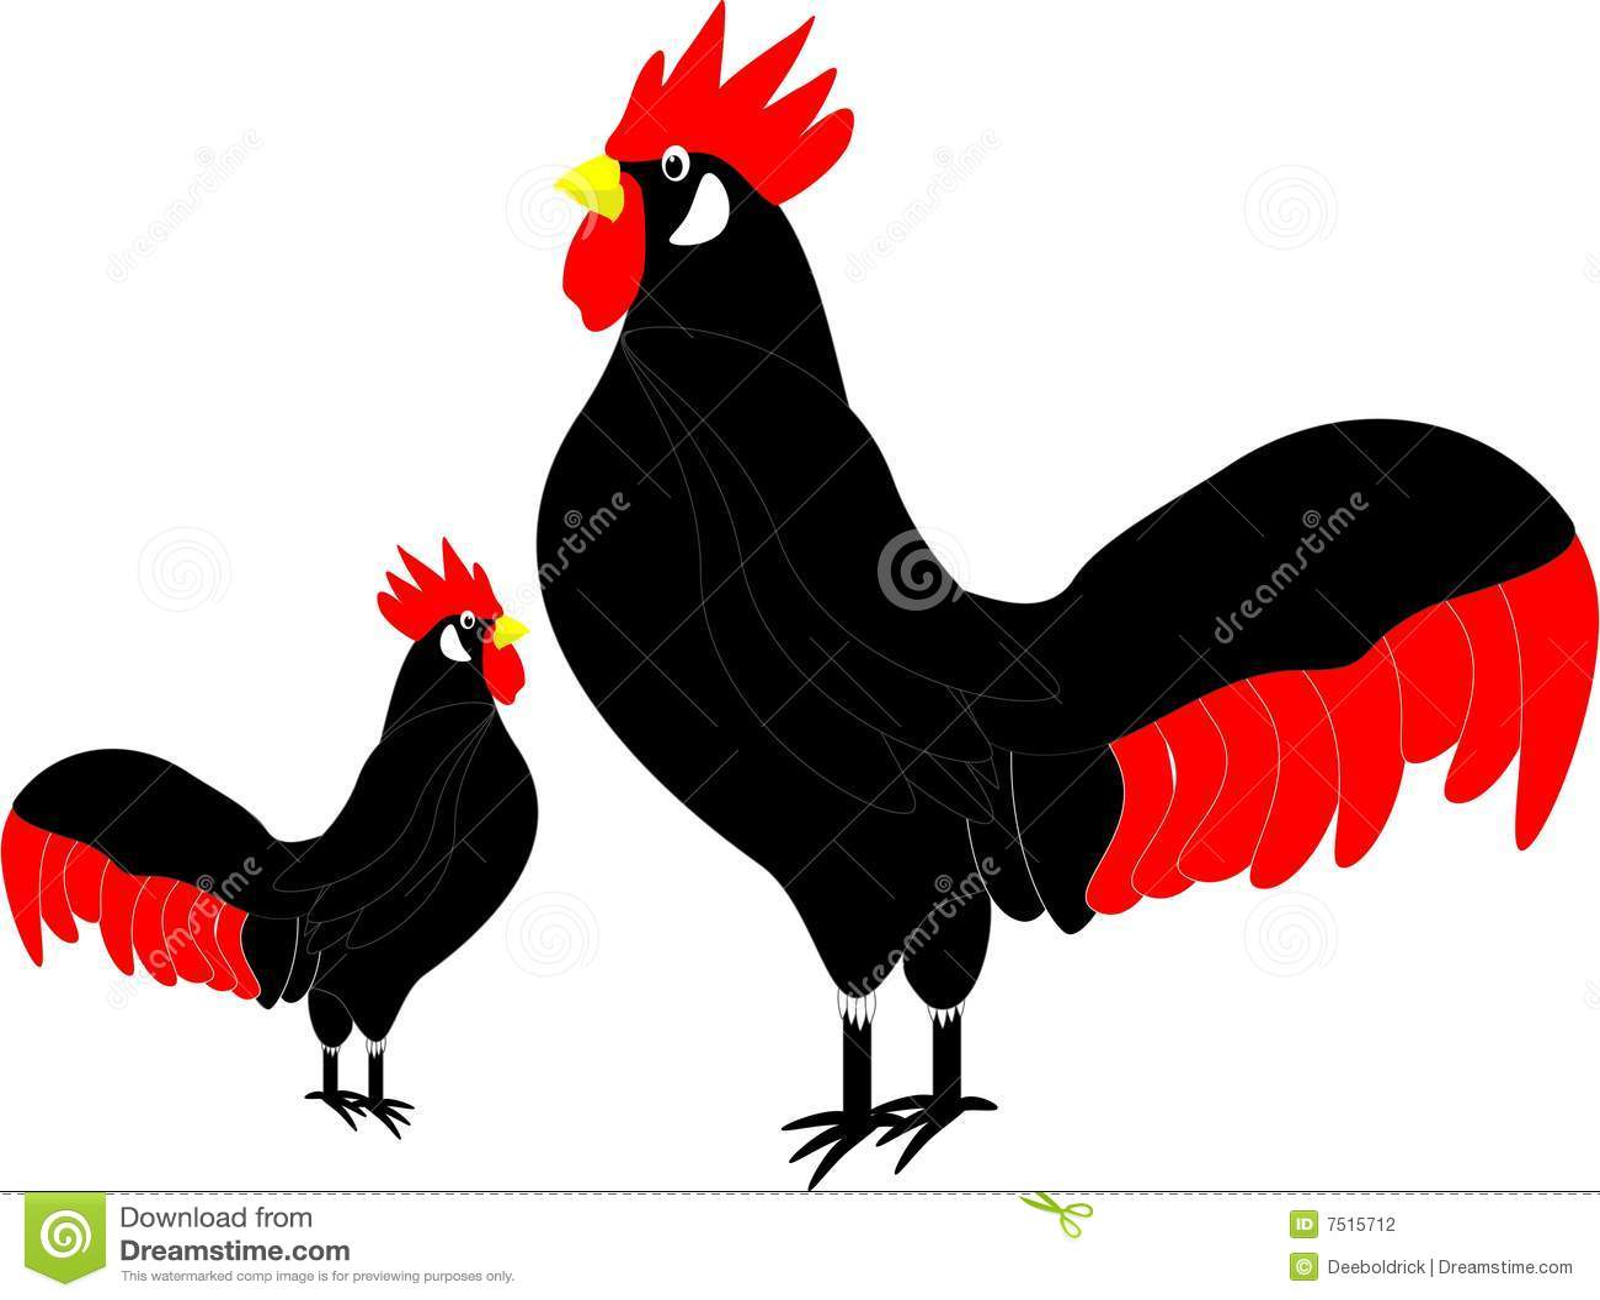 clip art rooster stock vector illustration of proud illustration rh dreamstime com Cartoon Rooster Clip Art Crowing Rooster Clip Art